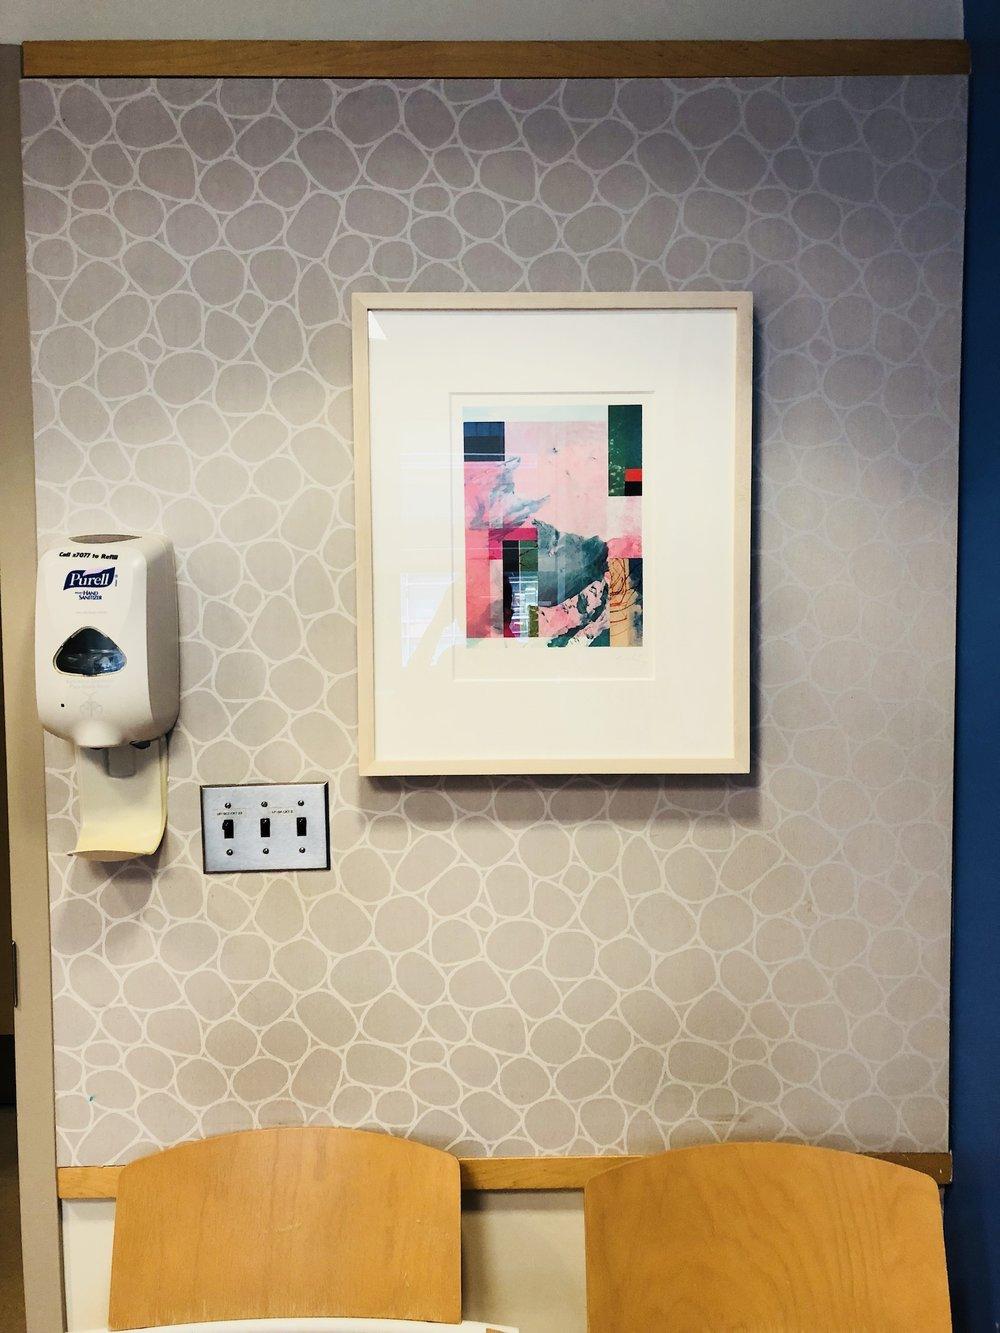 Installation View: Francisco Nicolas,  Pink Mountain,  2018